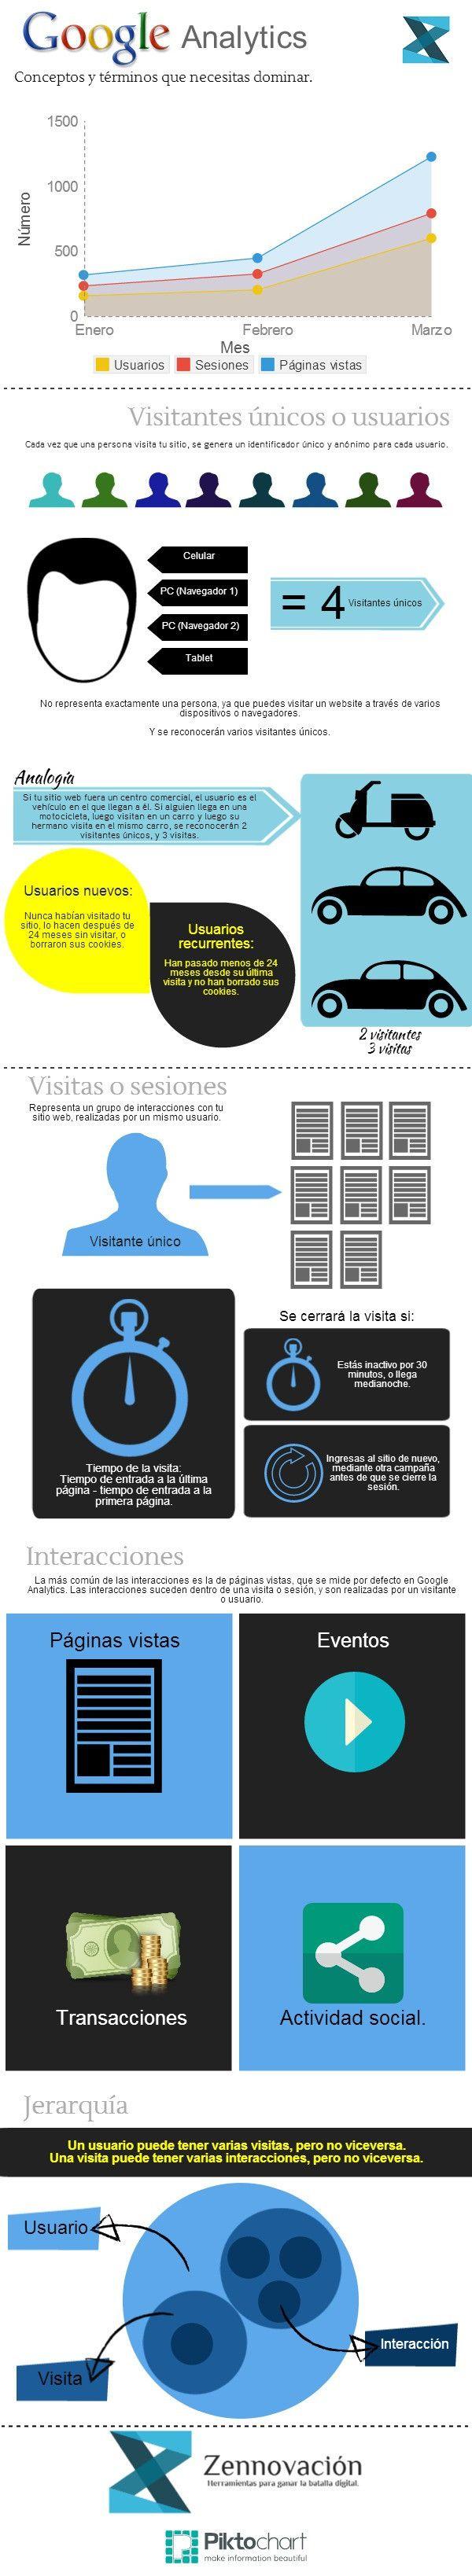 La terminología de Google Analytics #infografia #infographic #marketing #seo